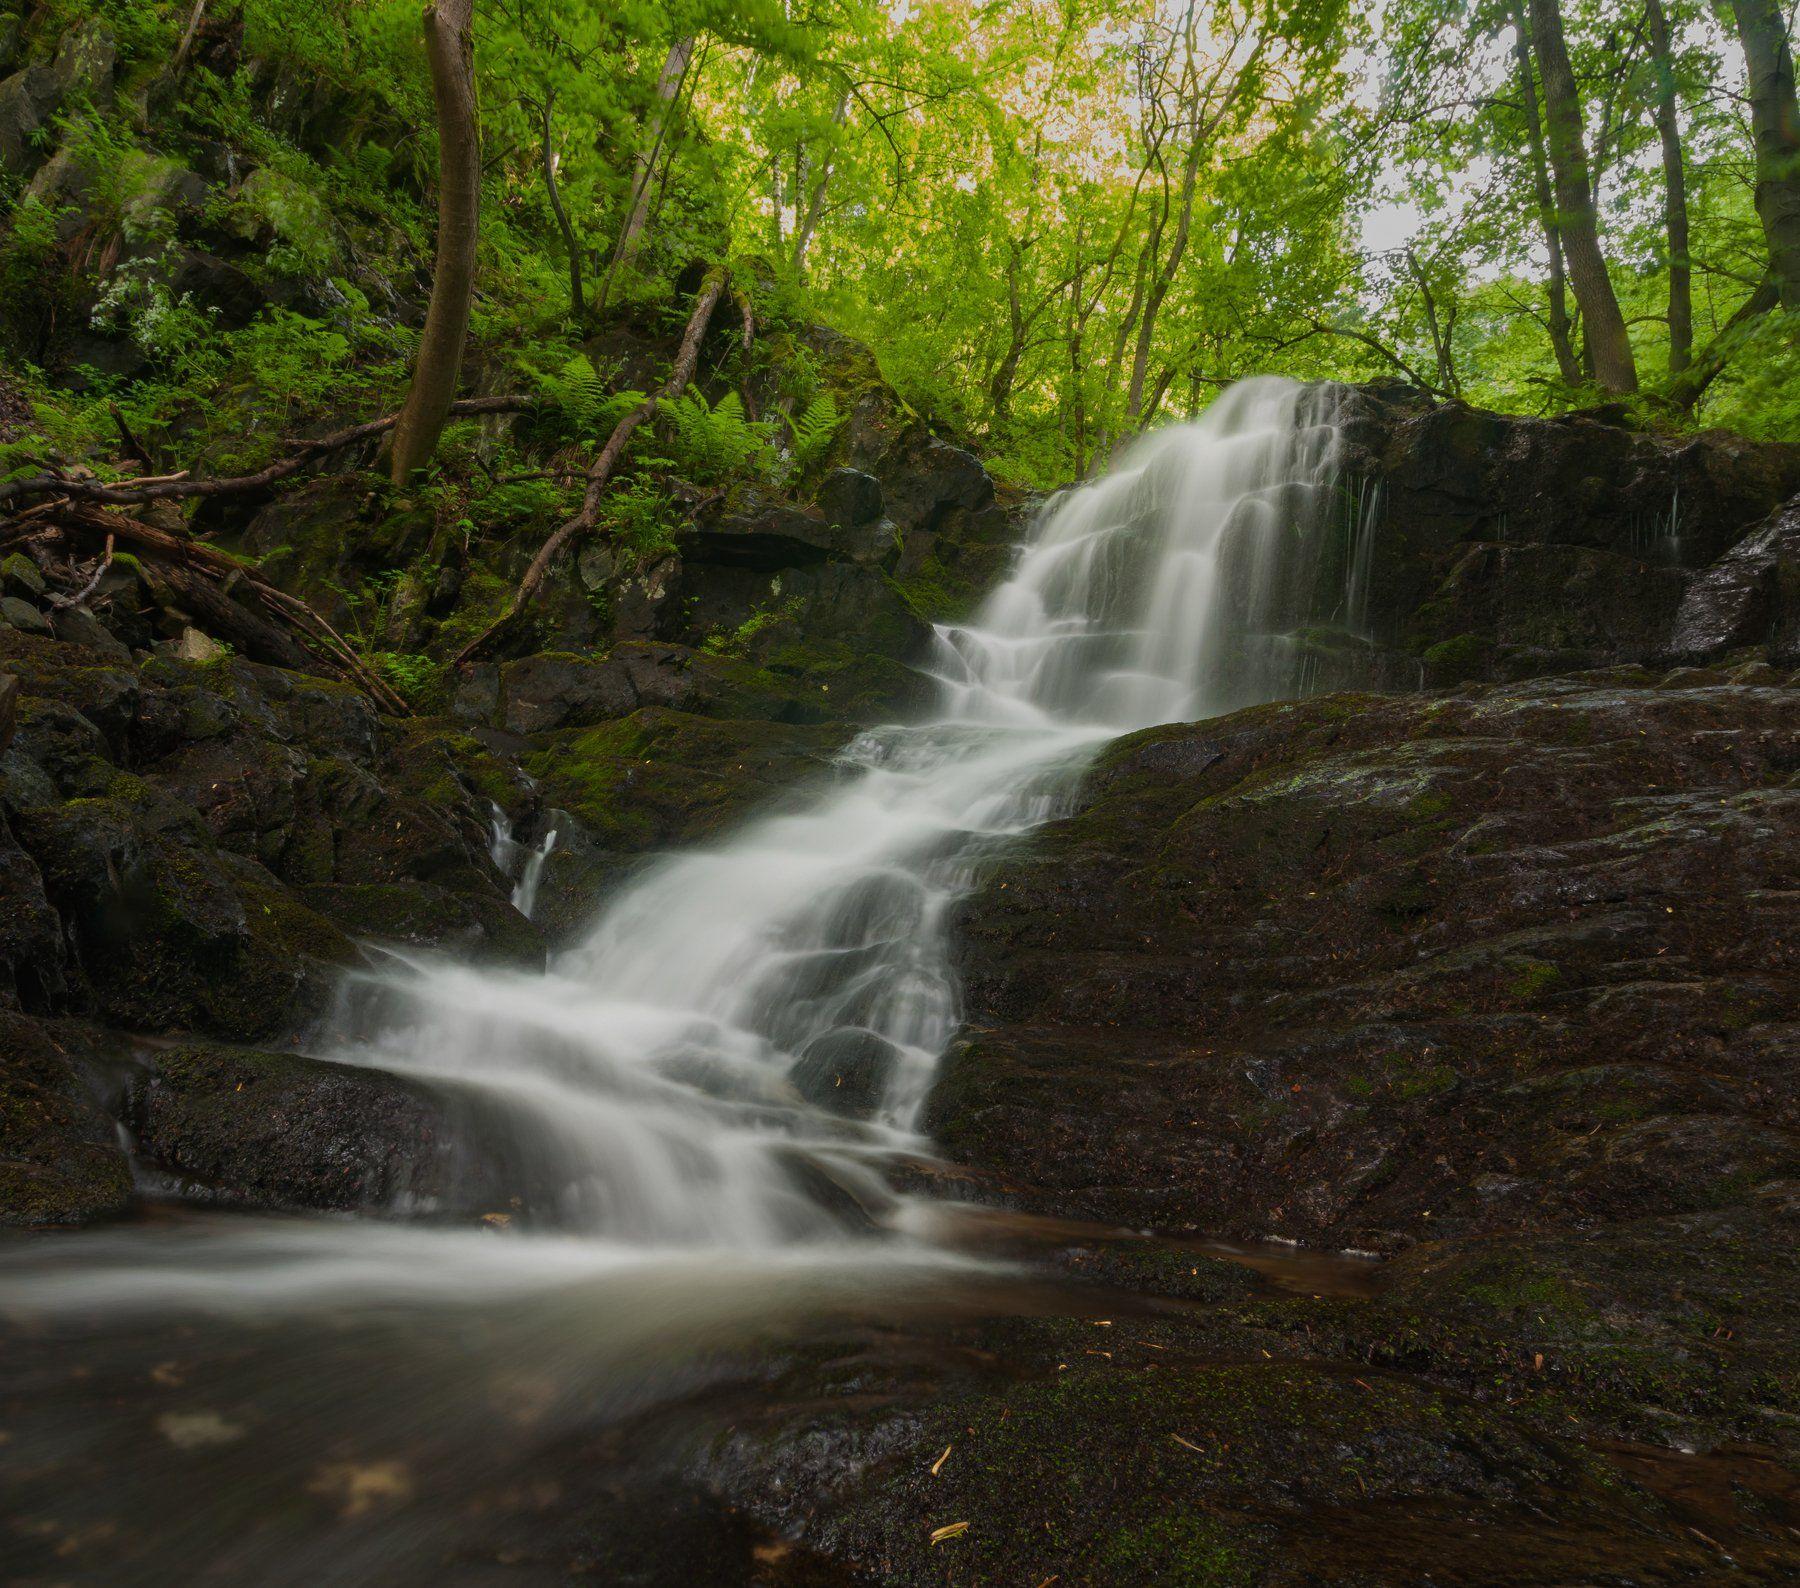 водопад, вода,  water, waterfall, landscape, nature, forest, nikon , Иван Димитров